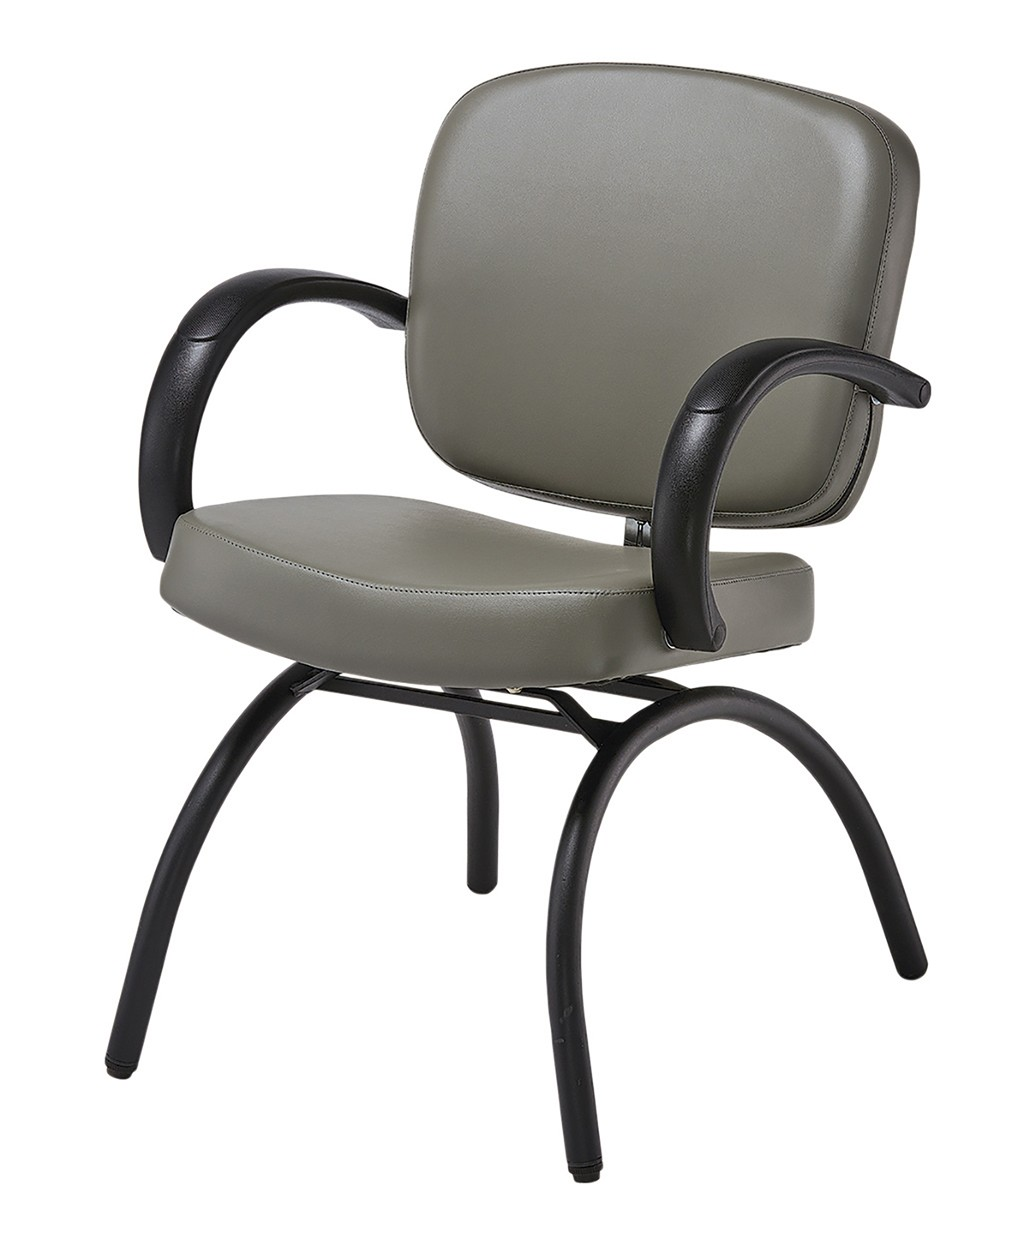 Pibbs 3620 Messina Reception Chair